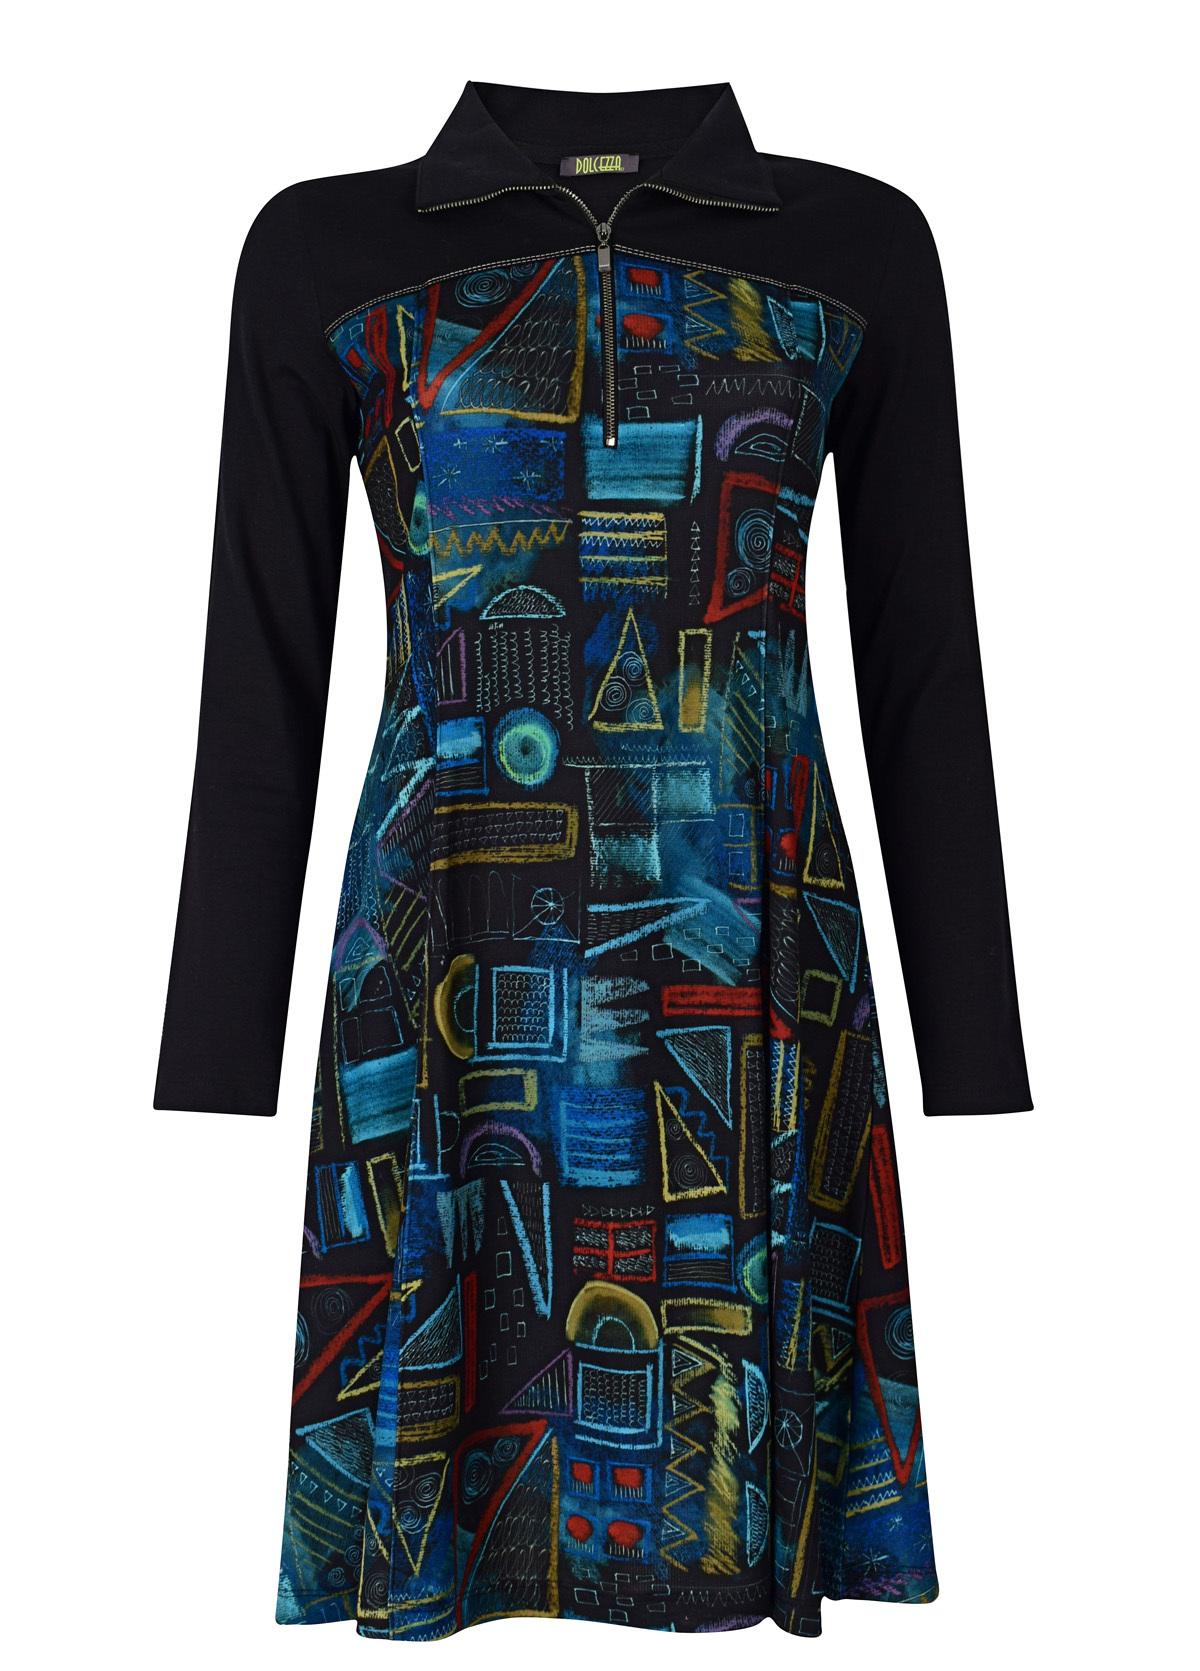 Dolcezza: Chalkboard Geometric Graffiti A-line Dress (1 Left!) Dolcezza_59193